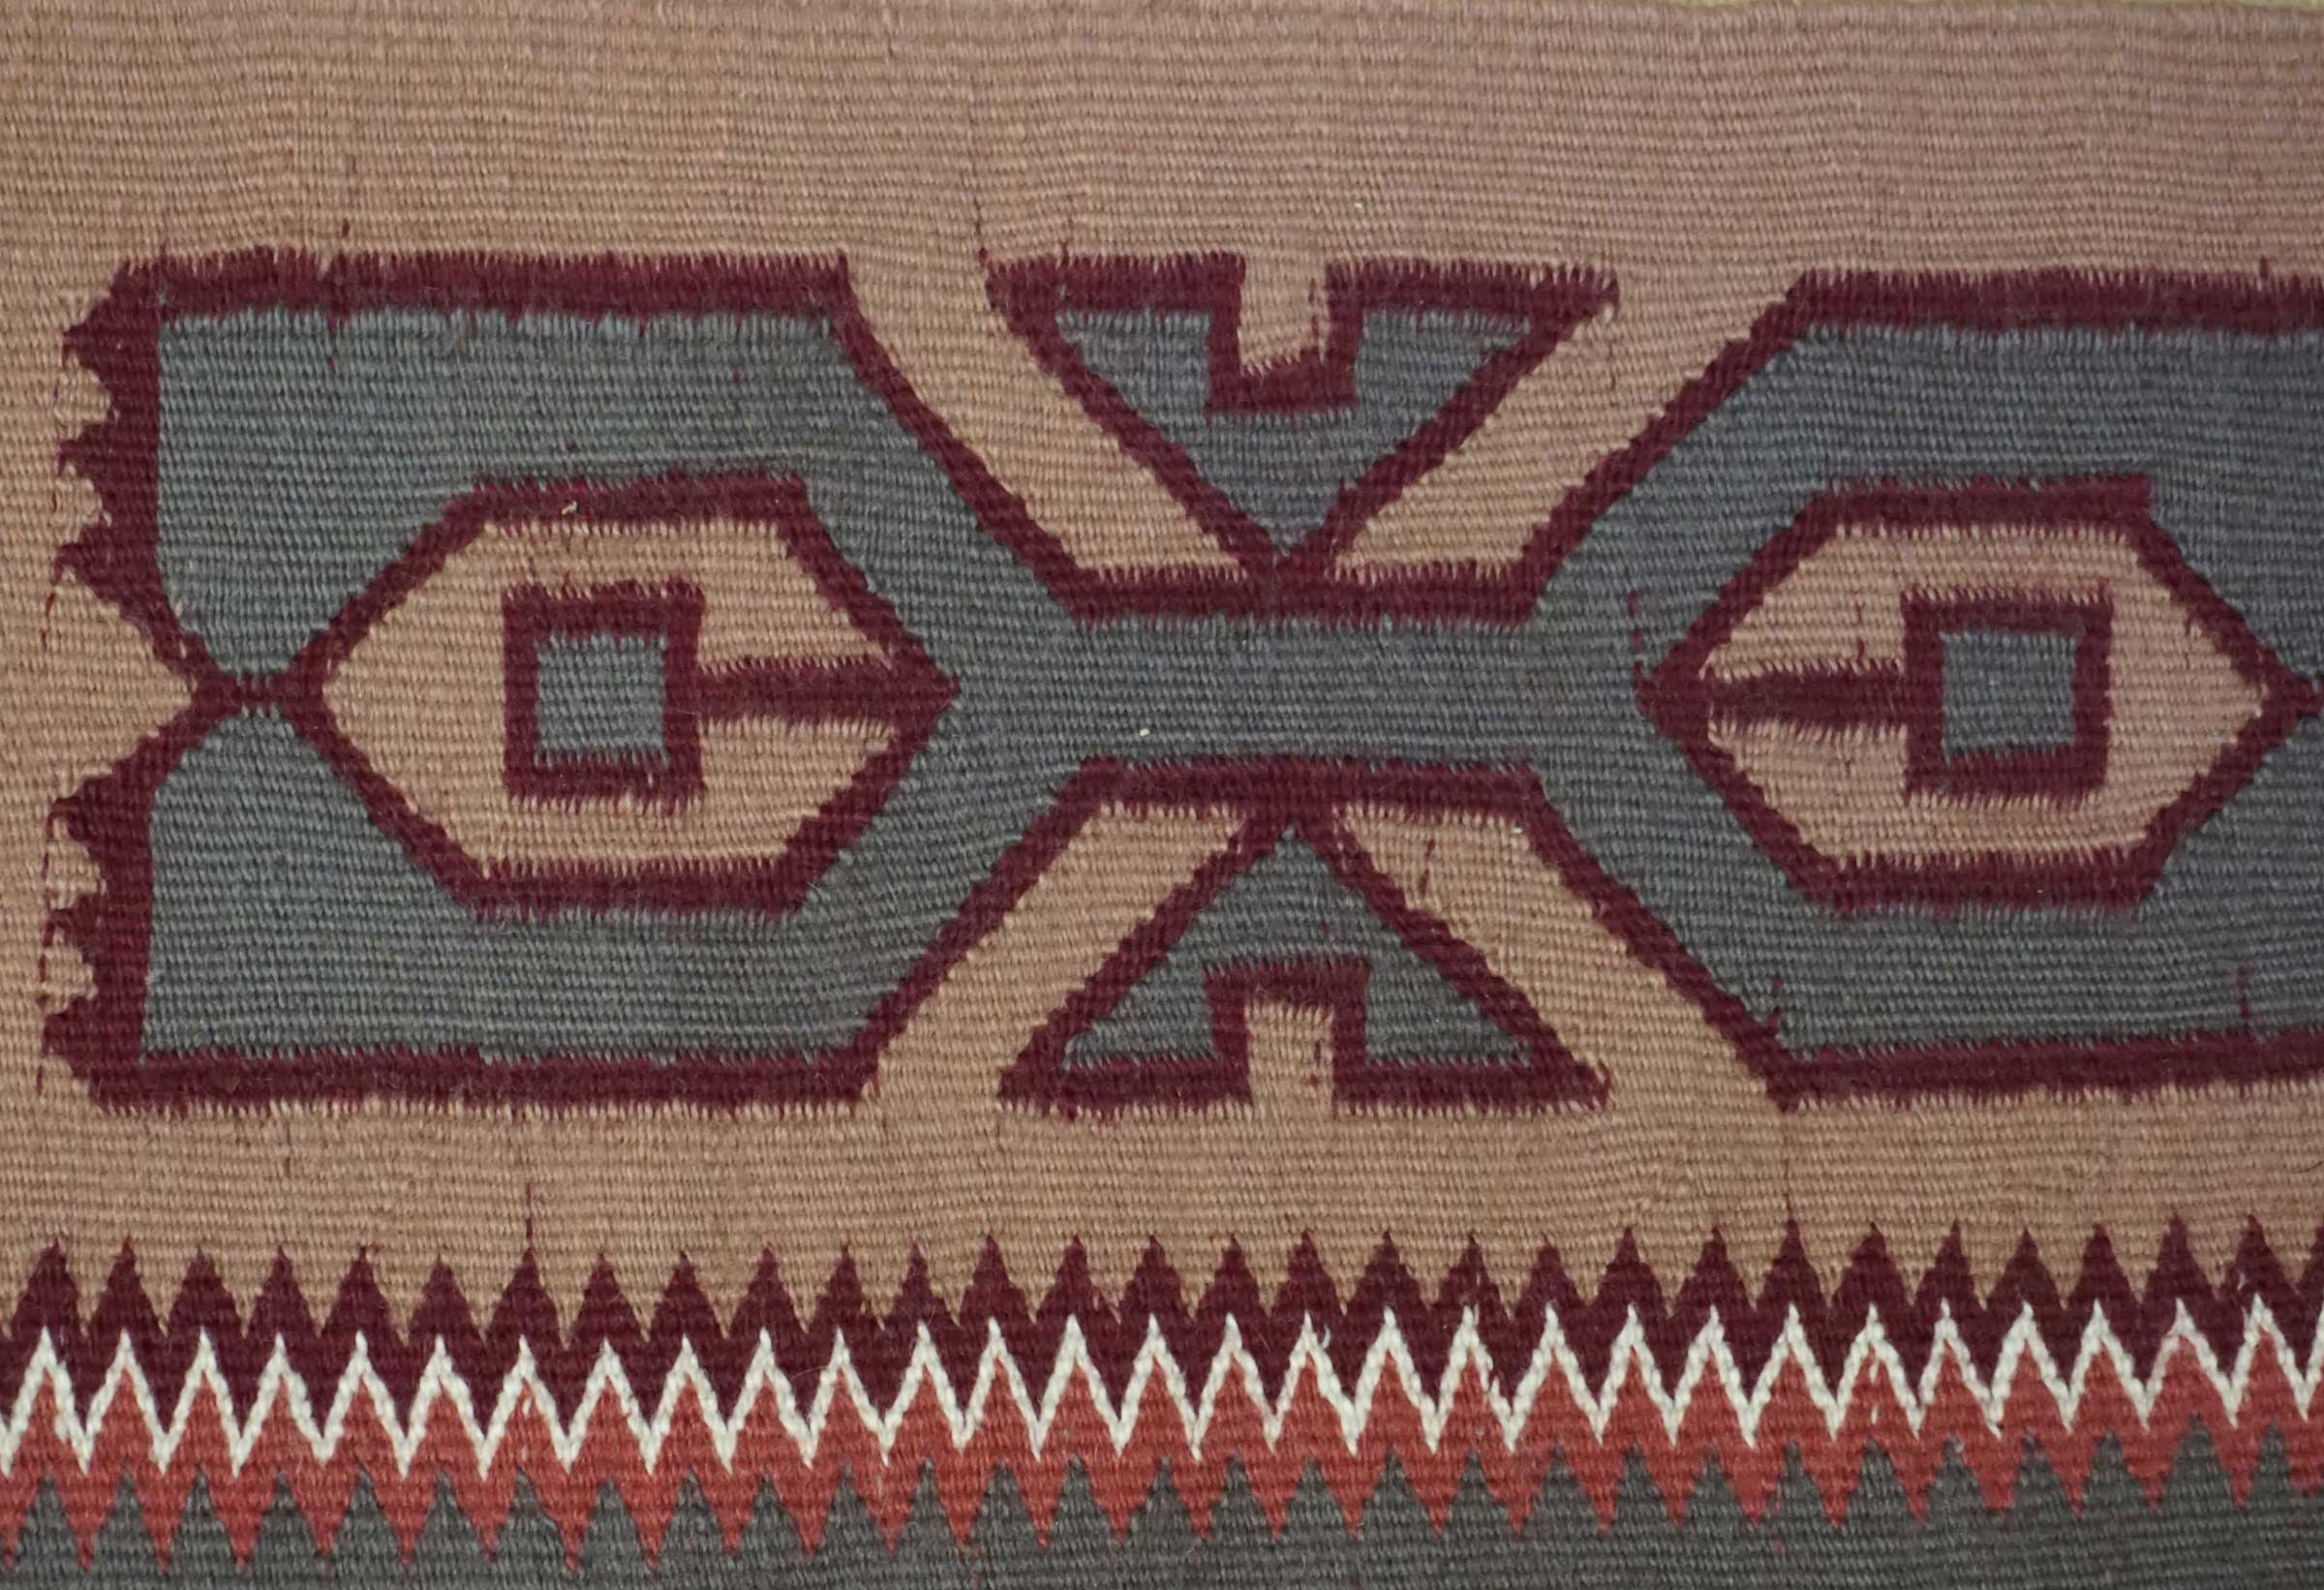 teec nos pos Native jackets, inc - on the santa fe plaza - 66 e san francisco st, ste 11 - santa fe, nm 87501 (888) 420-0005 or (505) 984-0005.